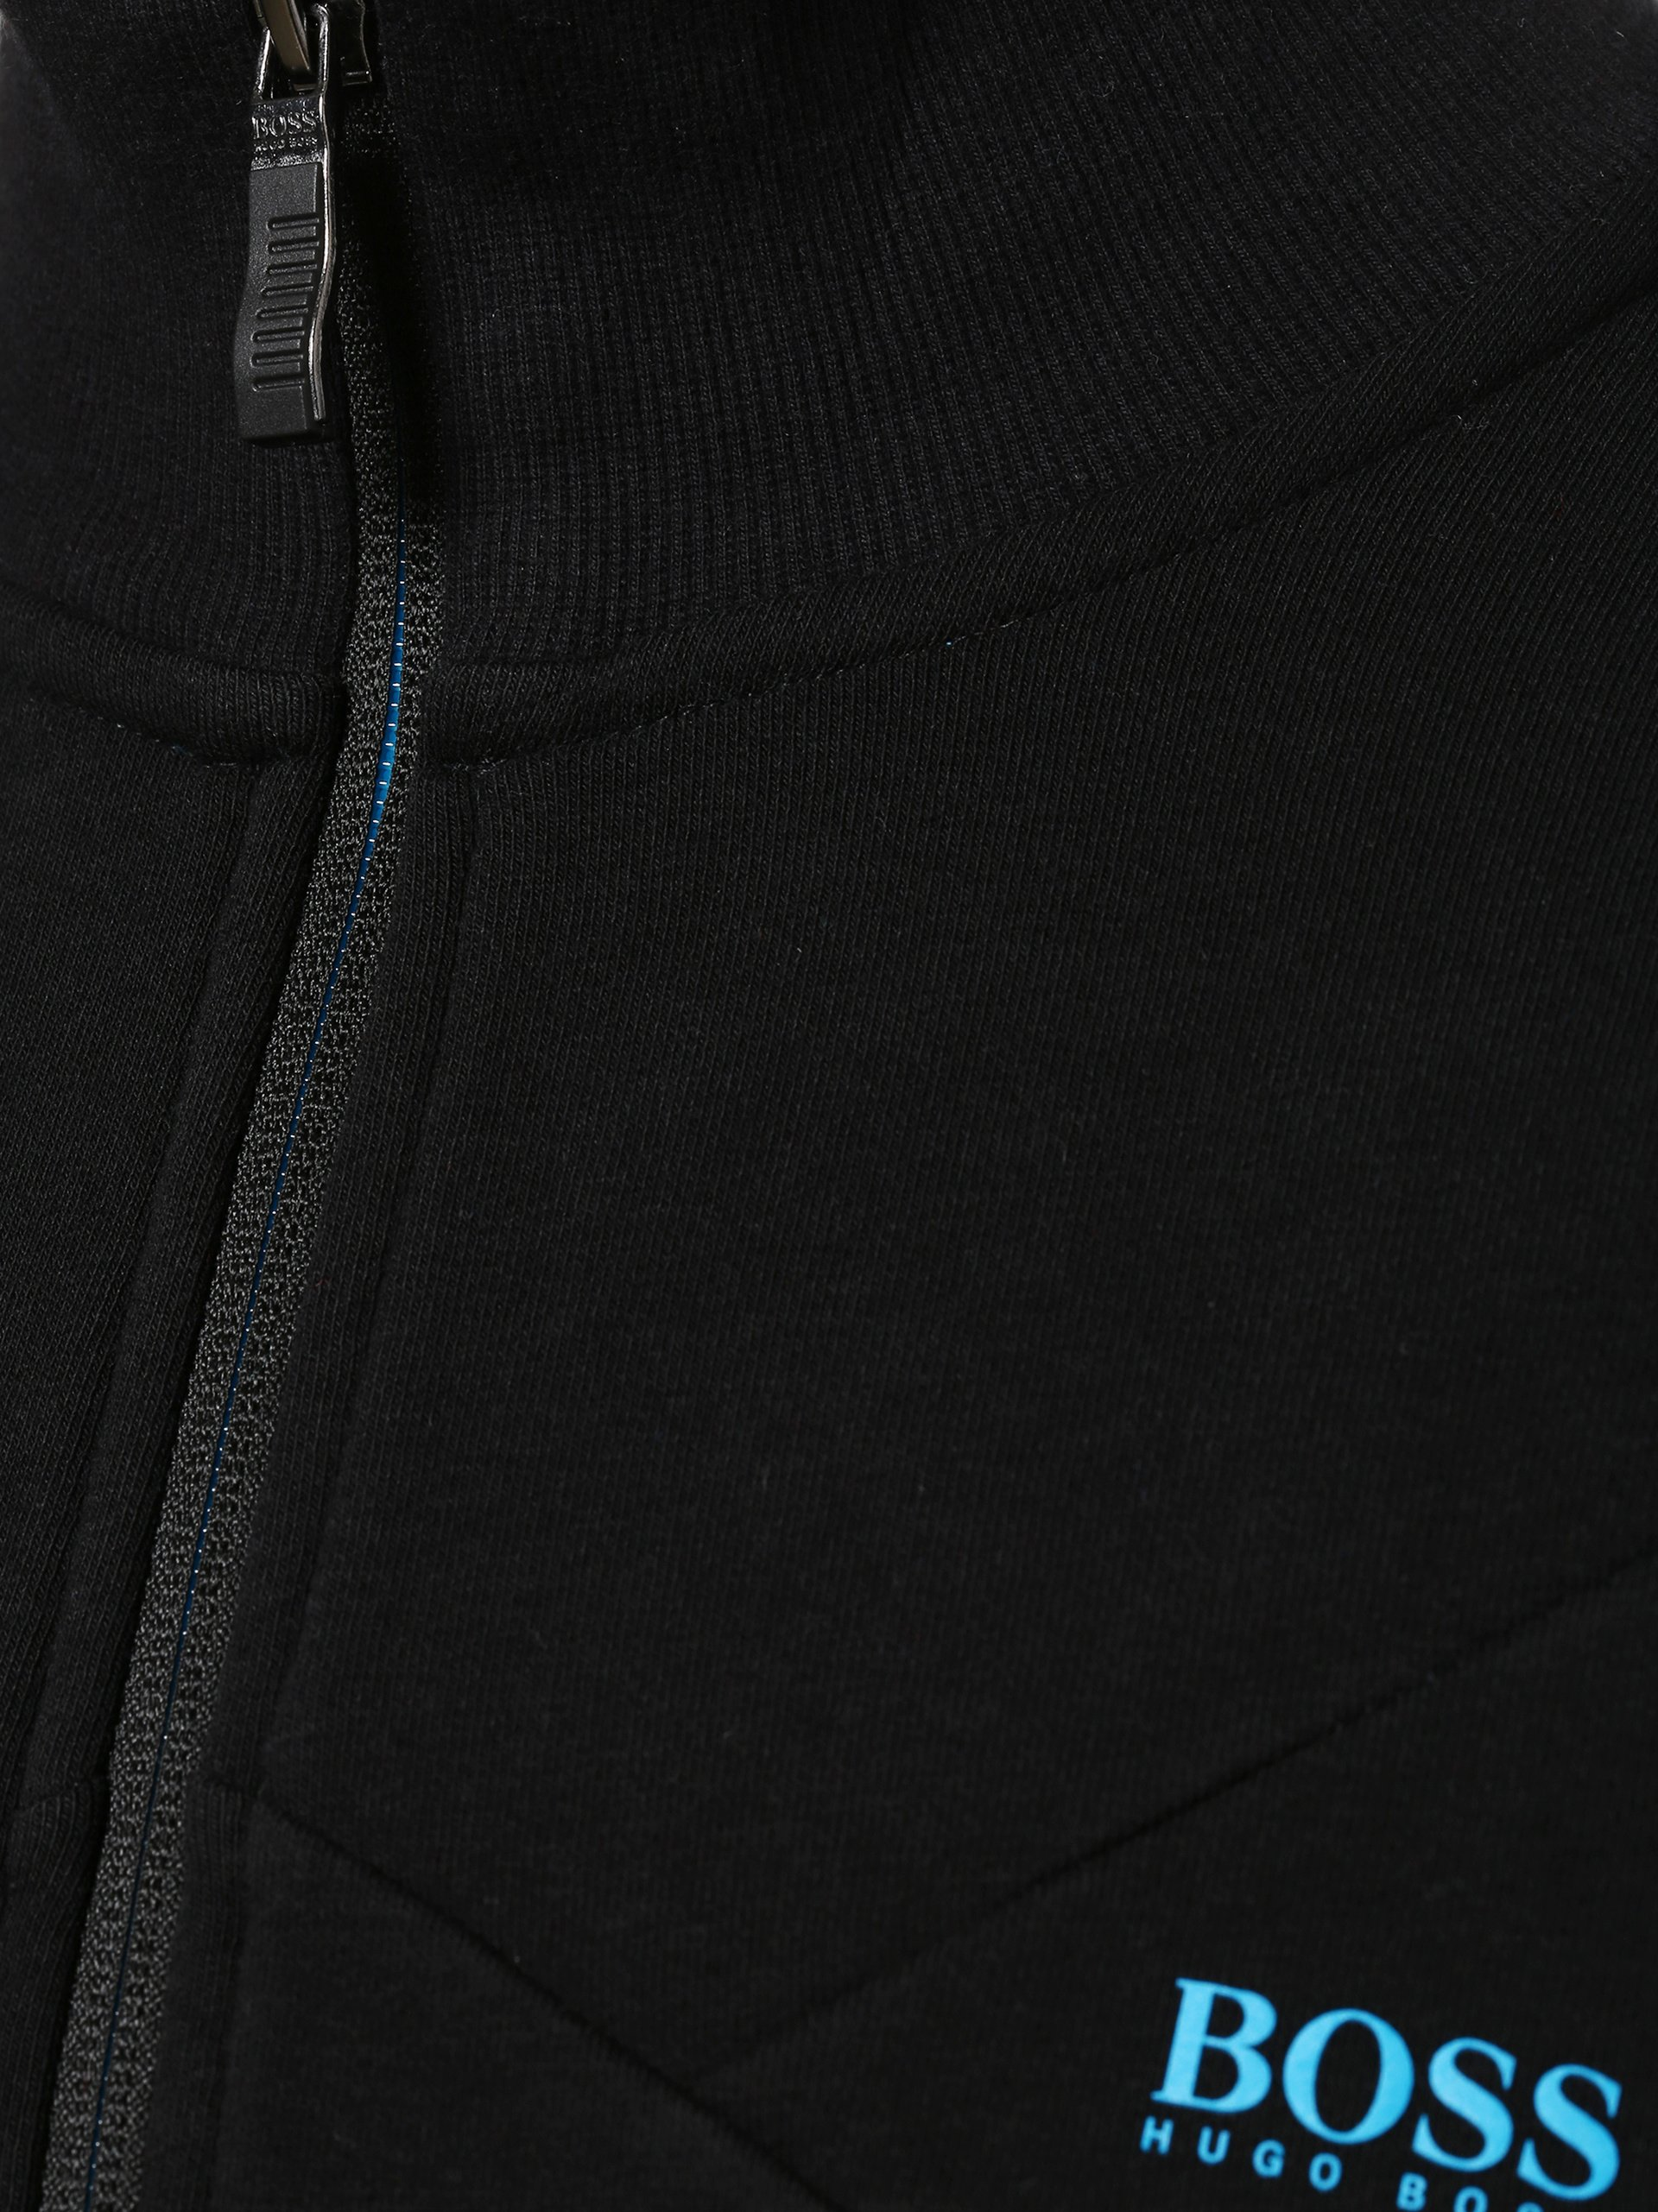 BOSS Athleisure Męska bluza rozpinana – Skaz 1